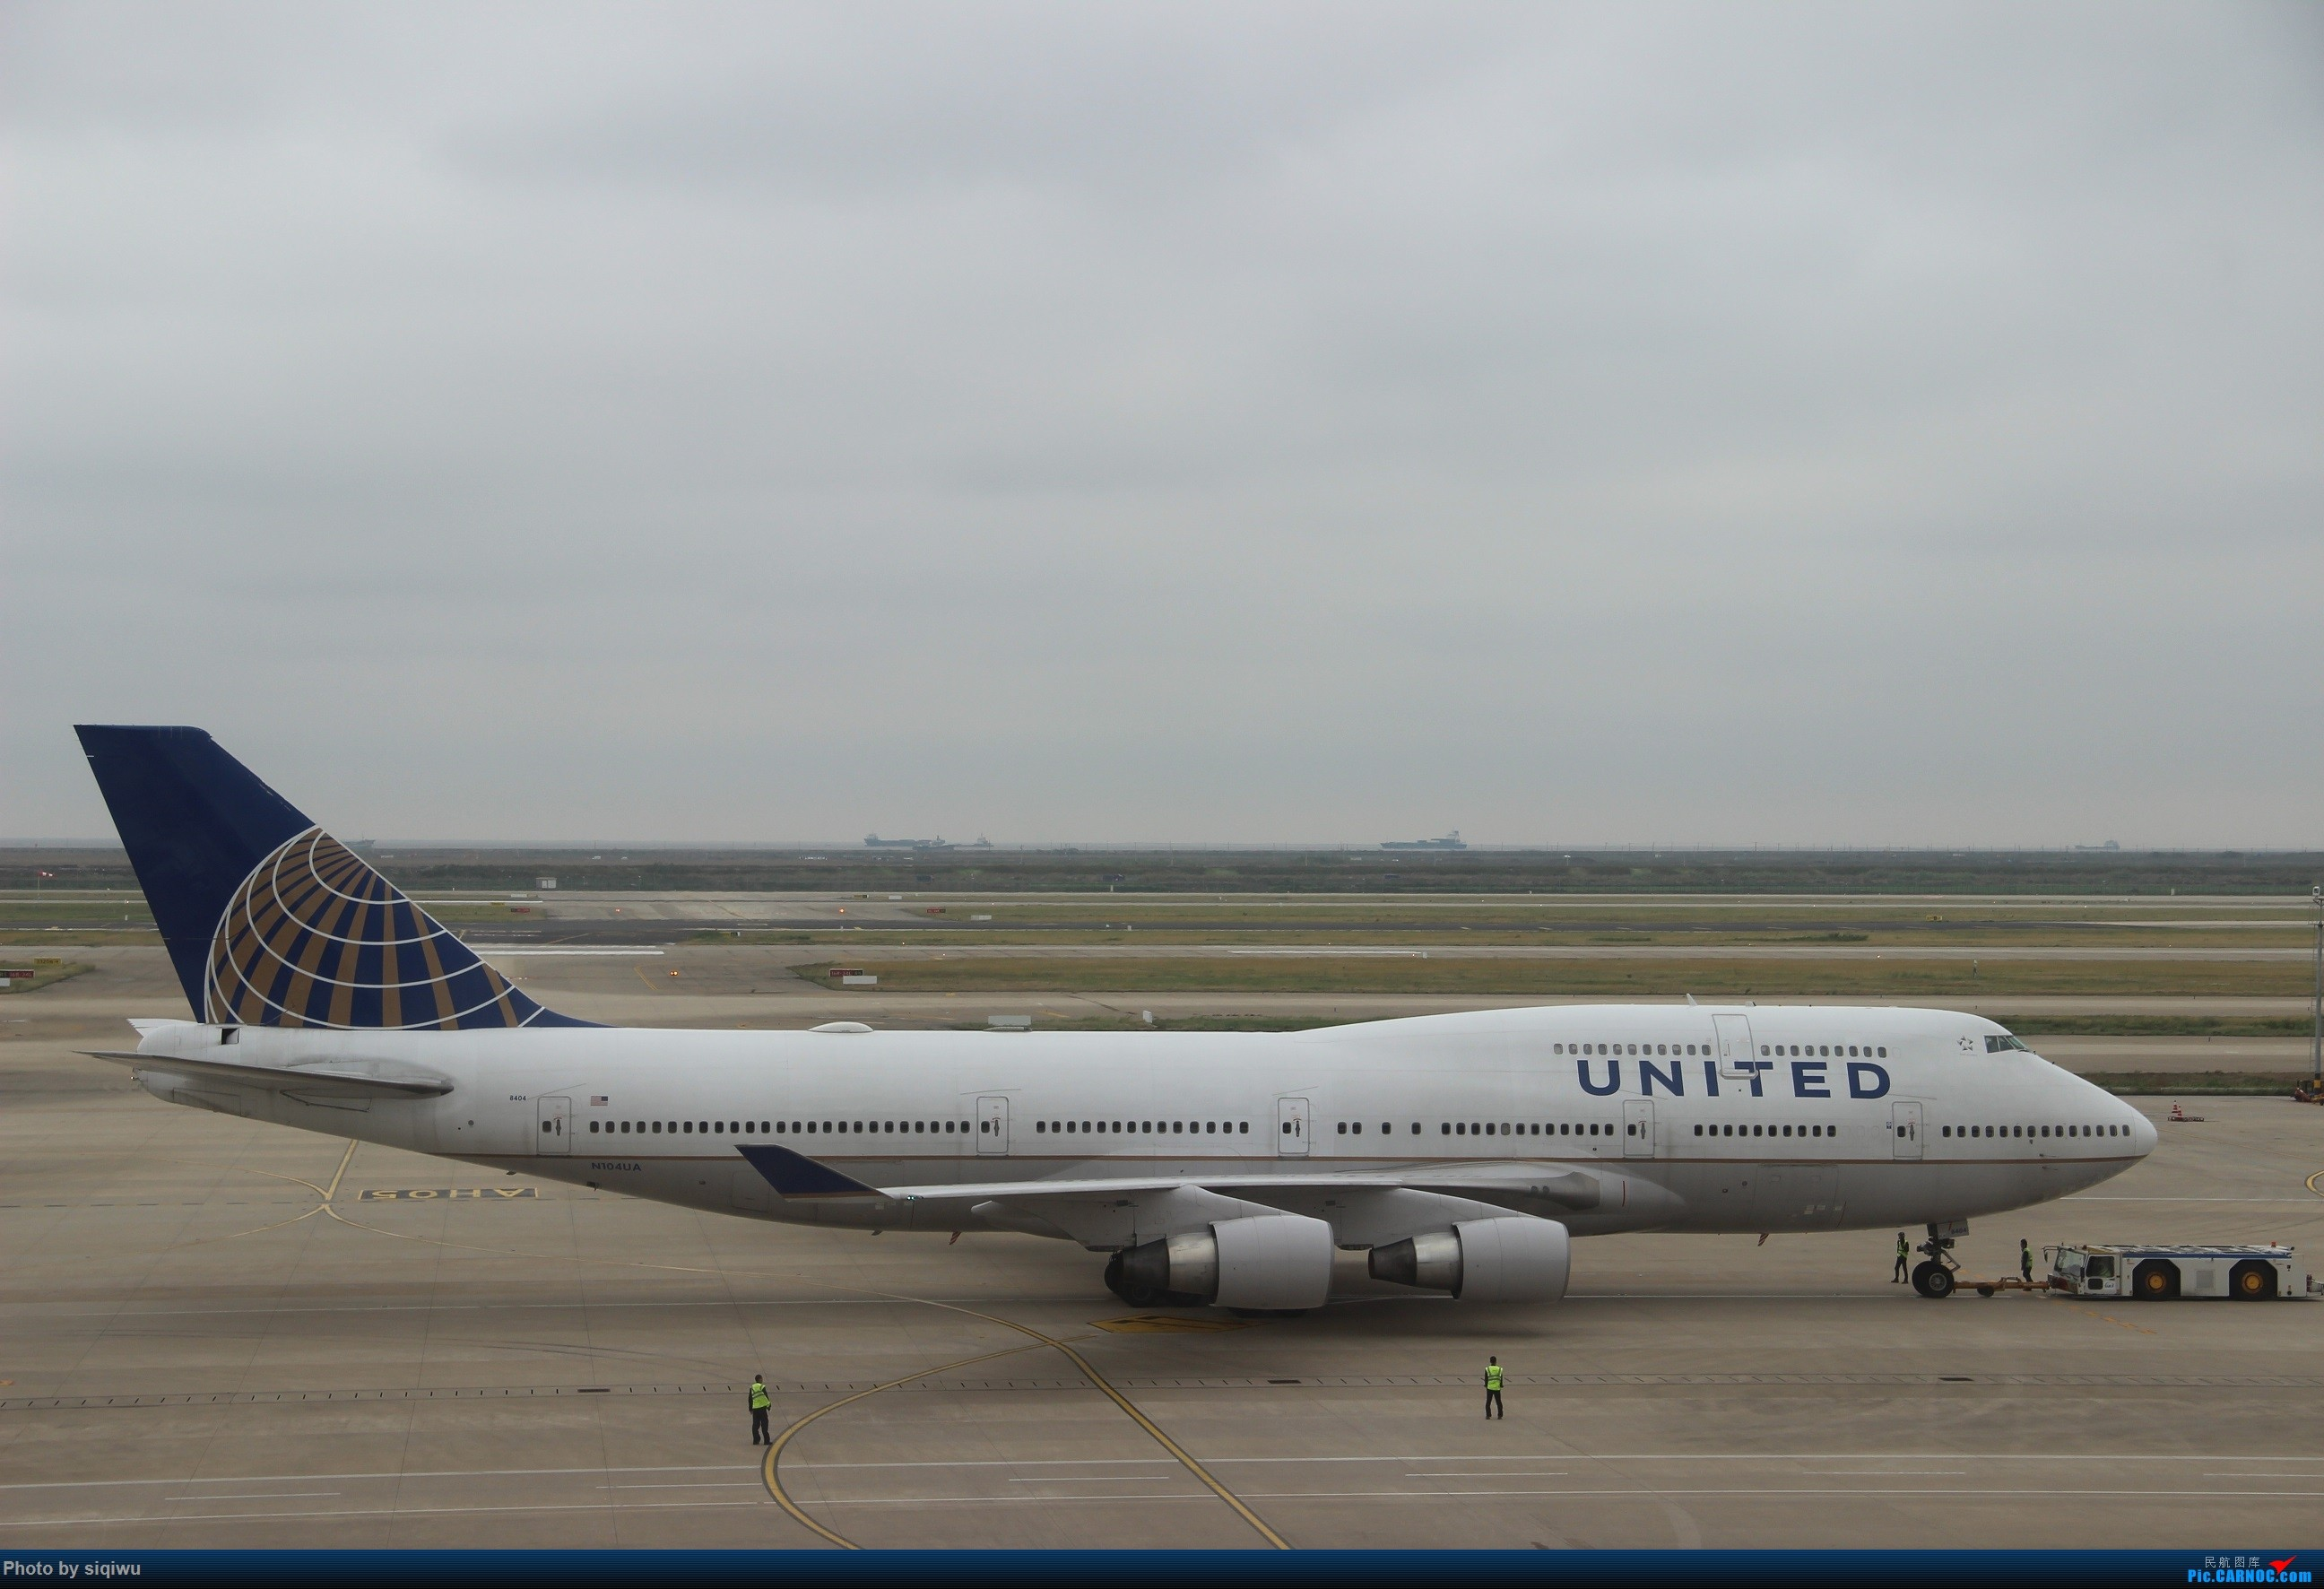 Re:[原创]PVG-HKG-KUL-HKG-PVG 四天往返,CX/KA BOEING 747-400  中国上海浦东国际机场